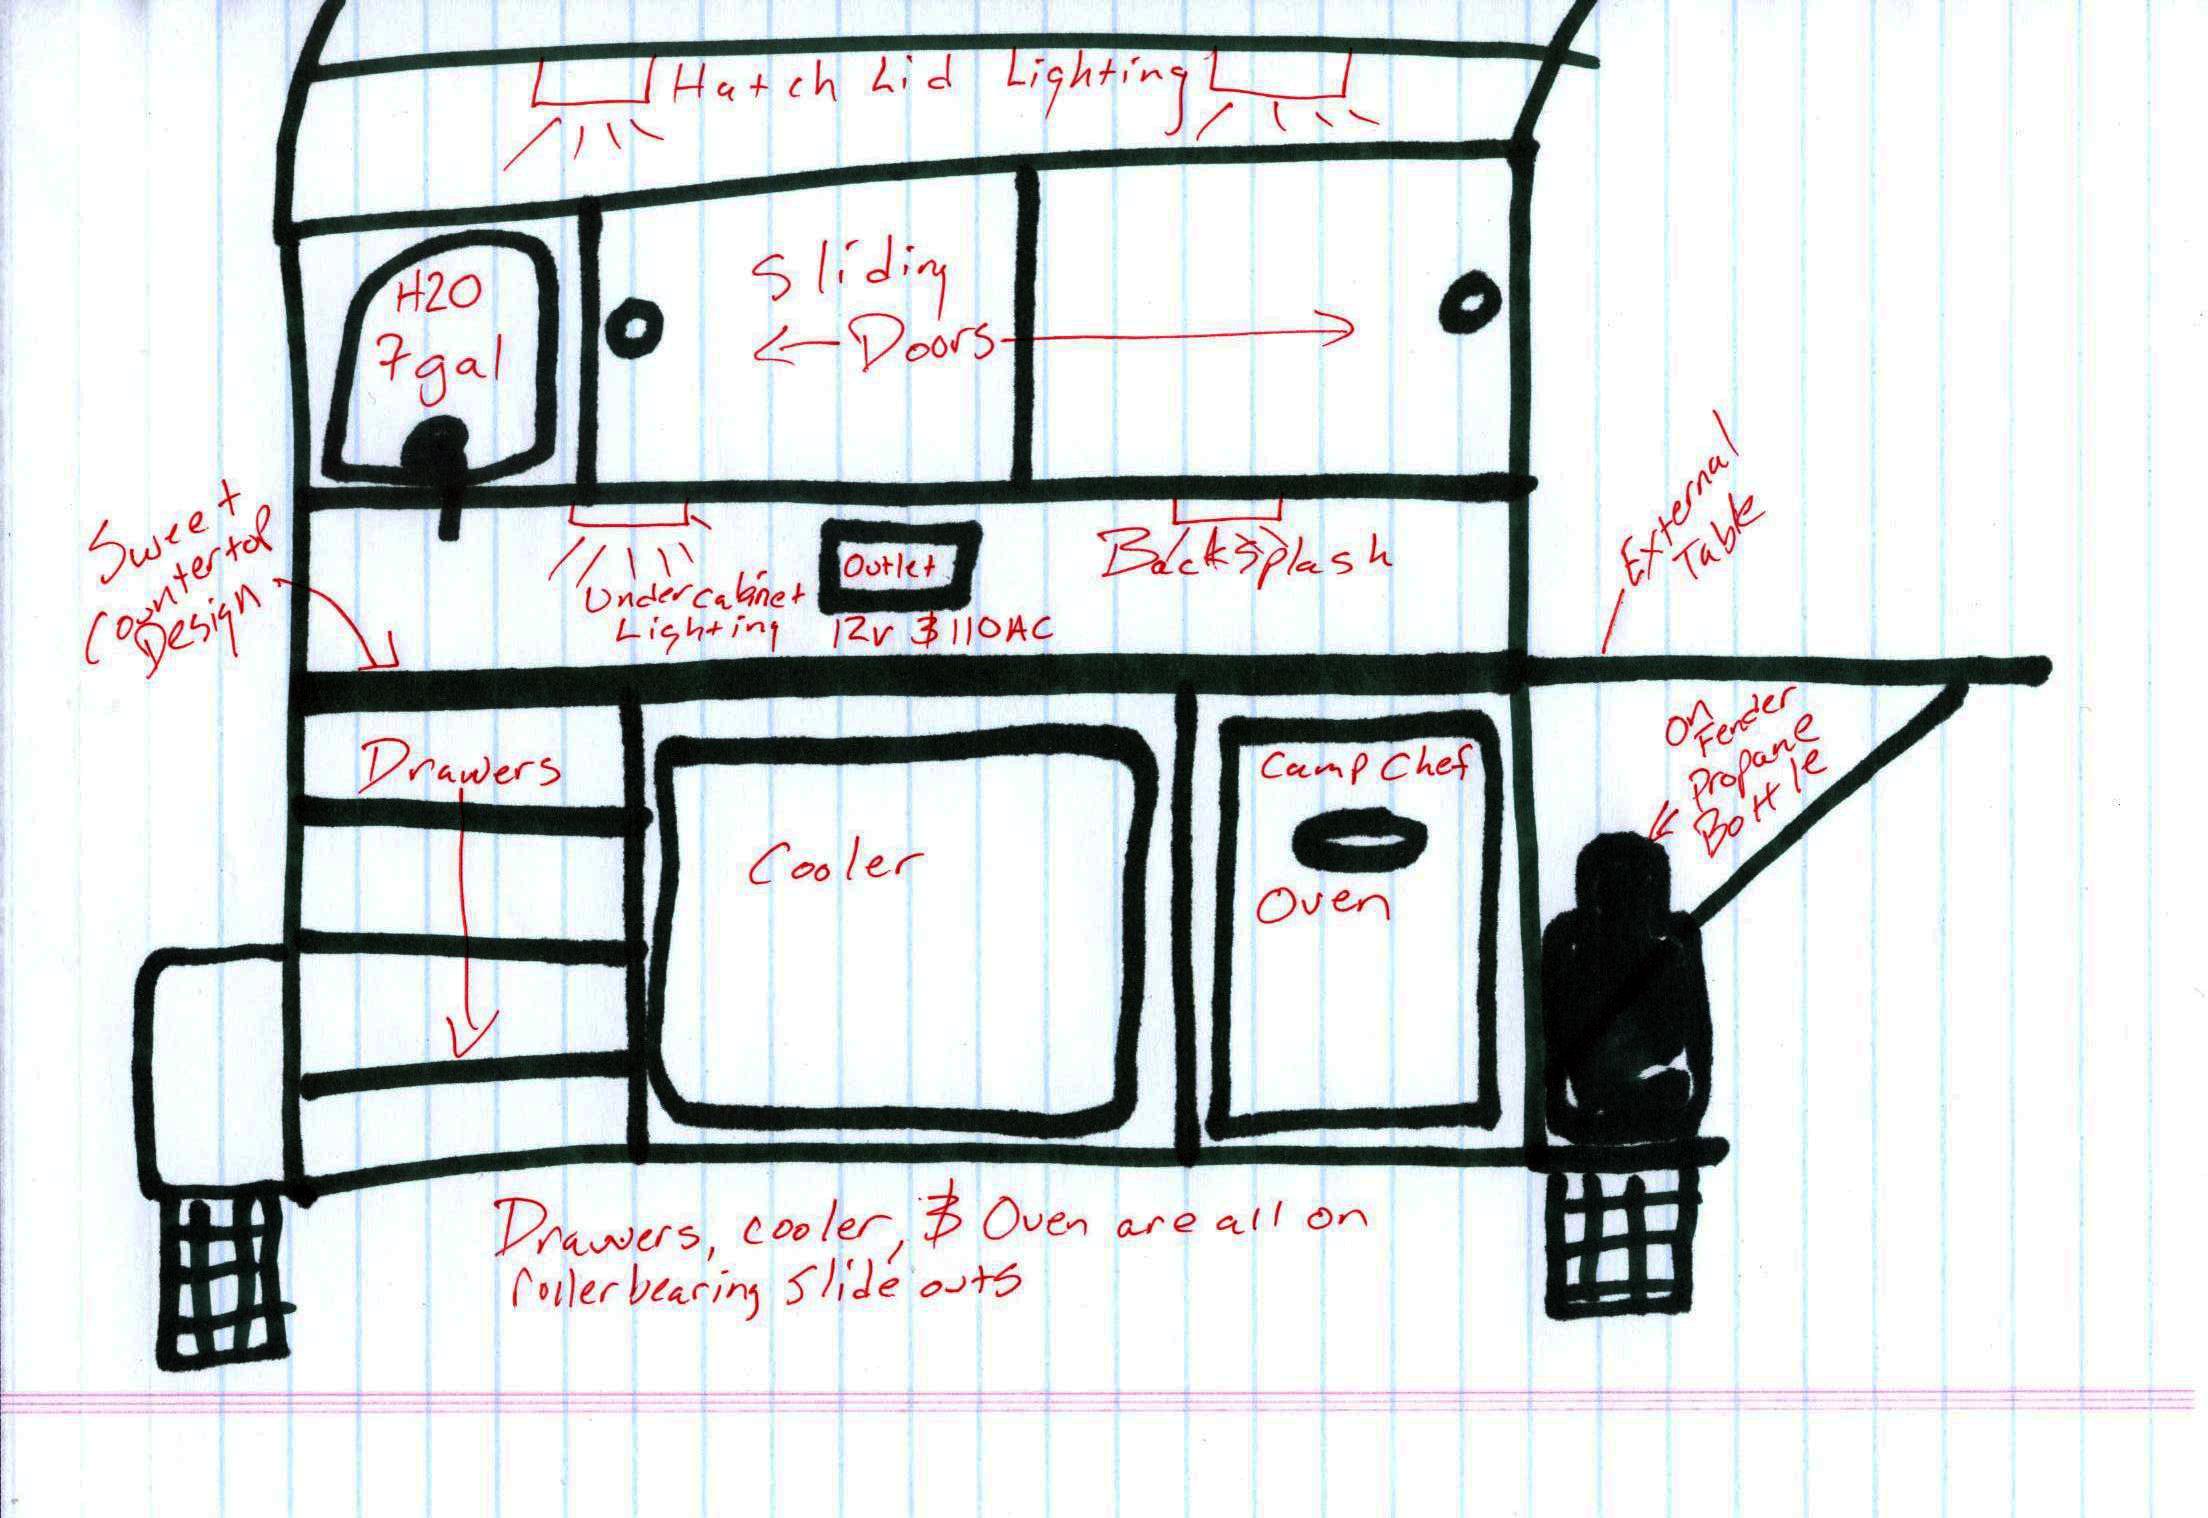 teardrop camper wiring diagram 2 pole definite purpose contactor galley overland trailer and adventure